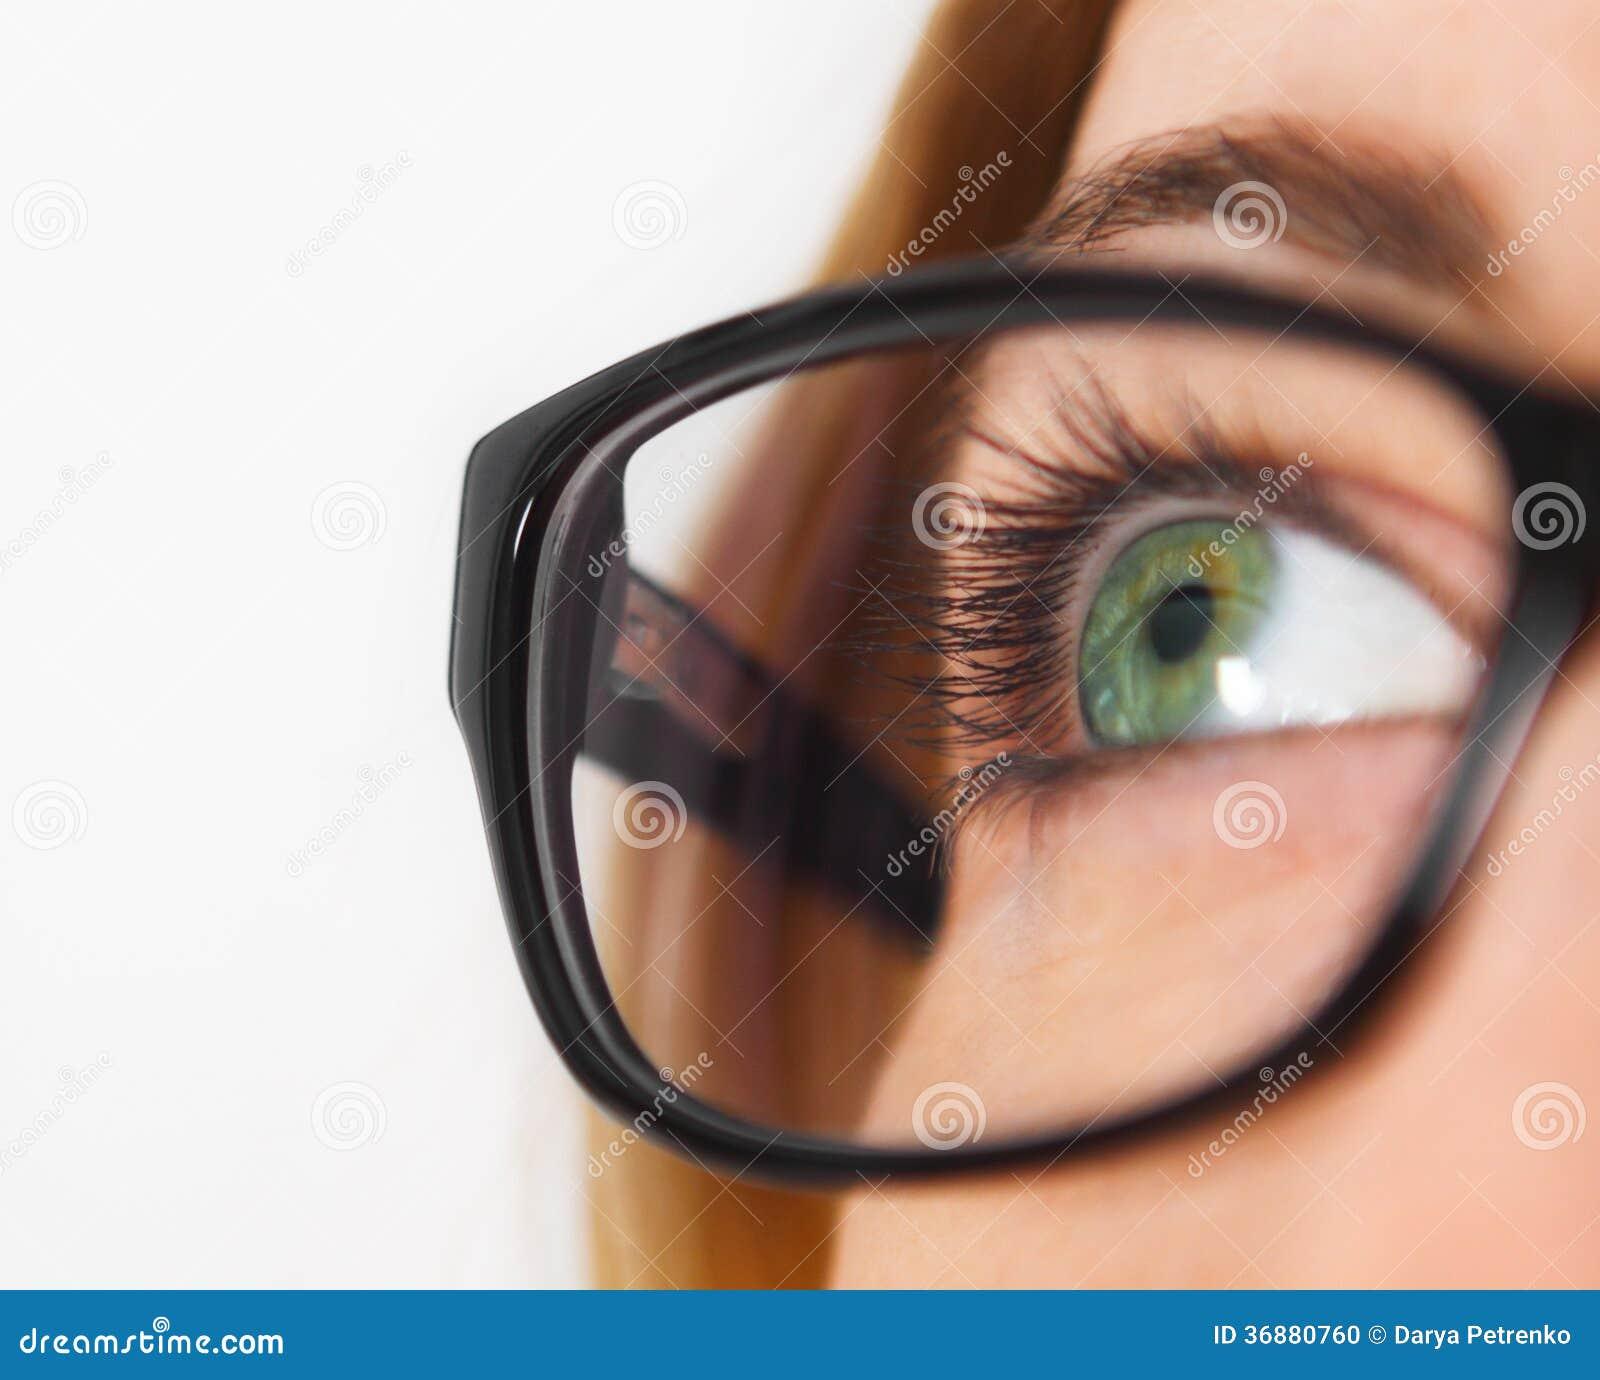 Close up of woman wearing black eye glasses